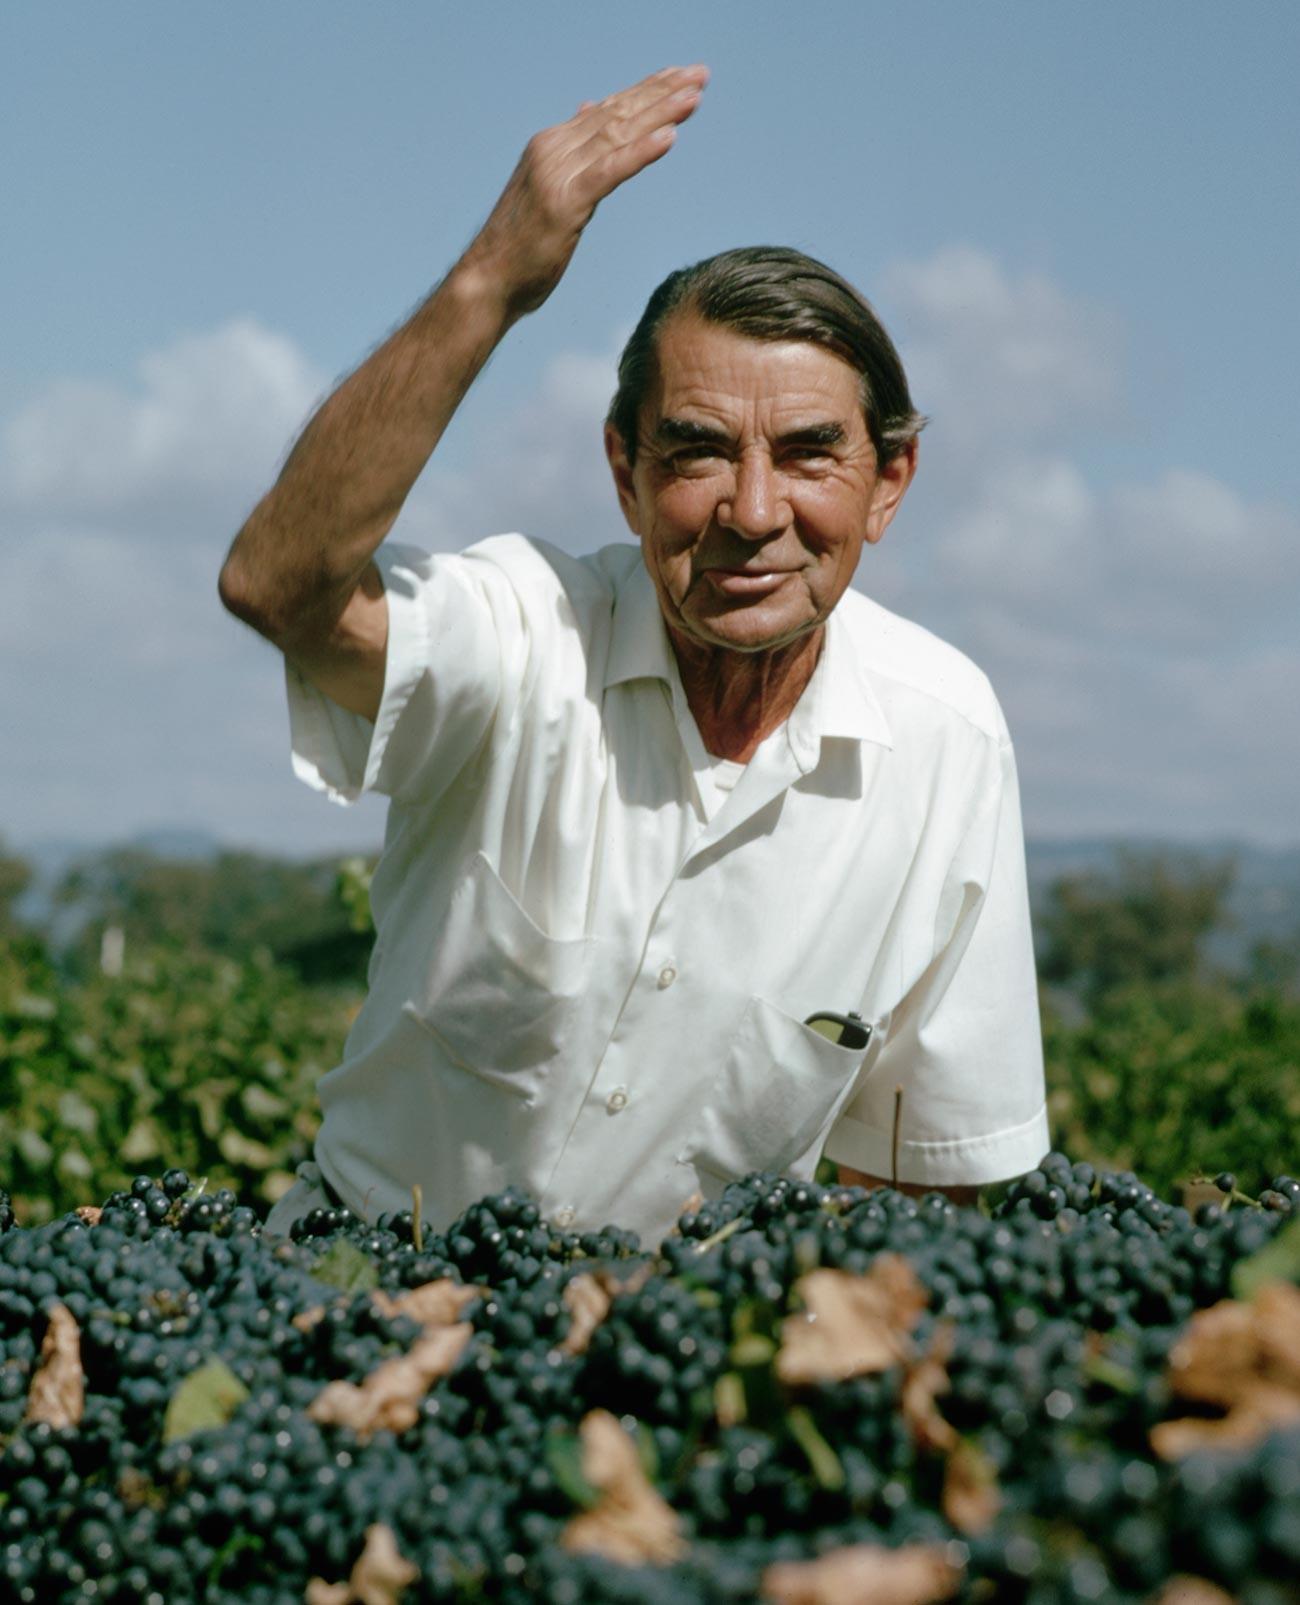 Winemaker Andre Tchelistcheff.